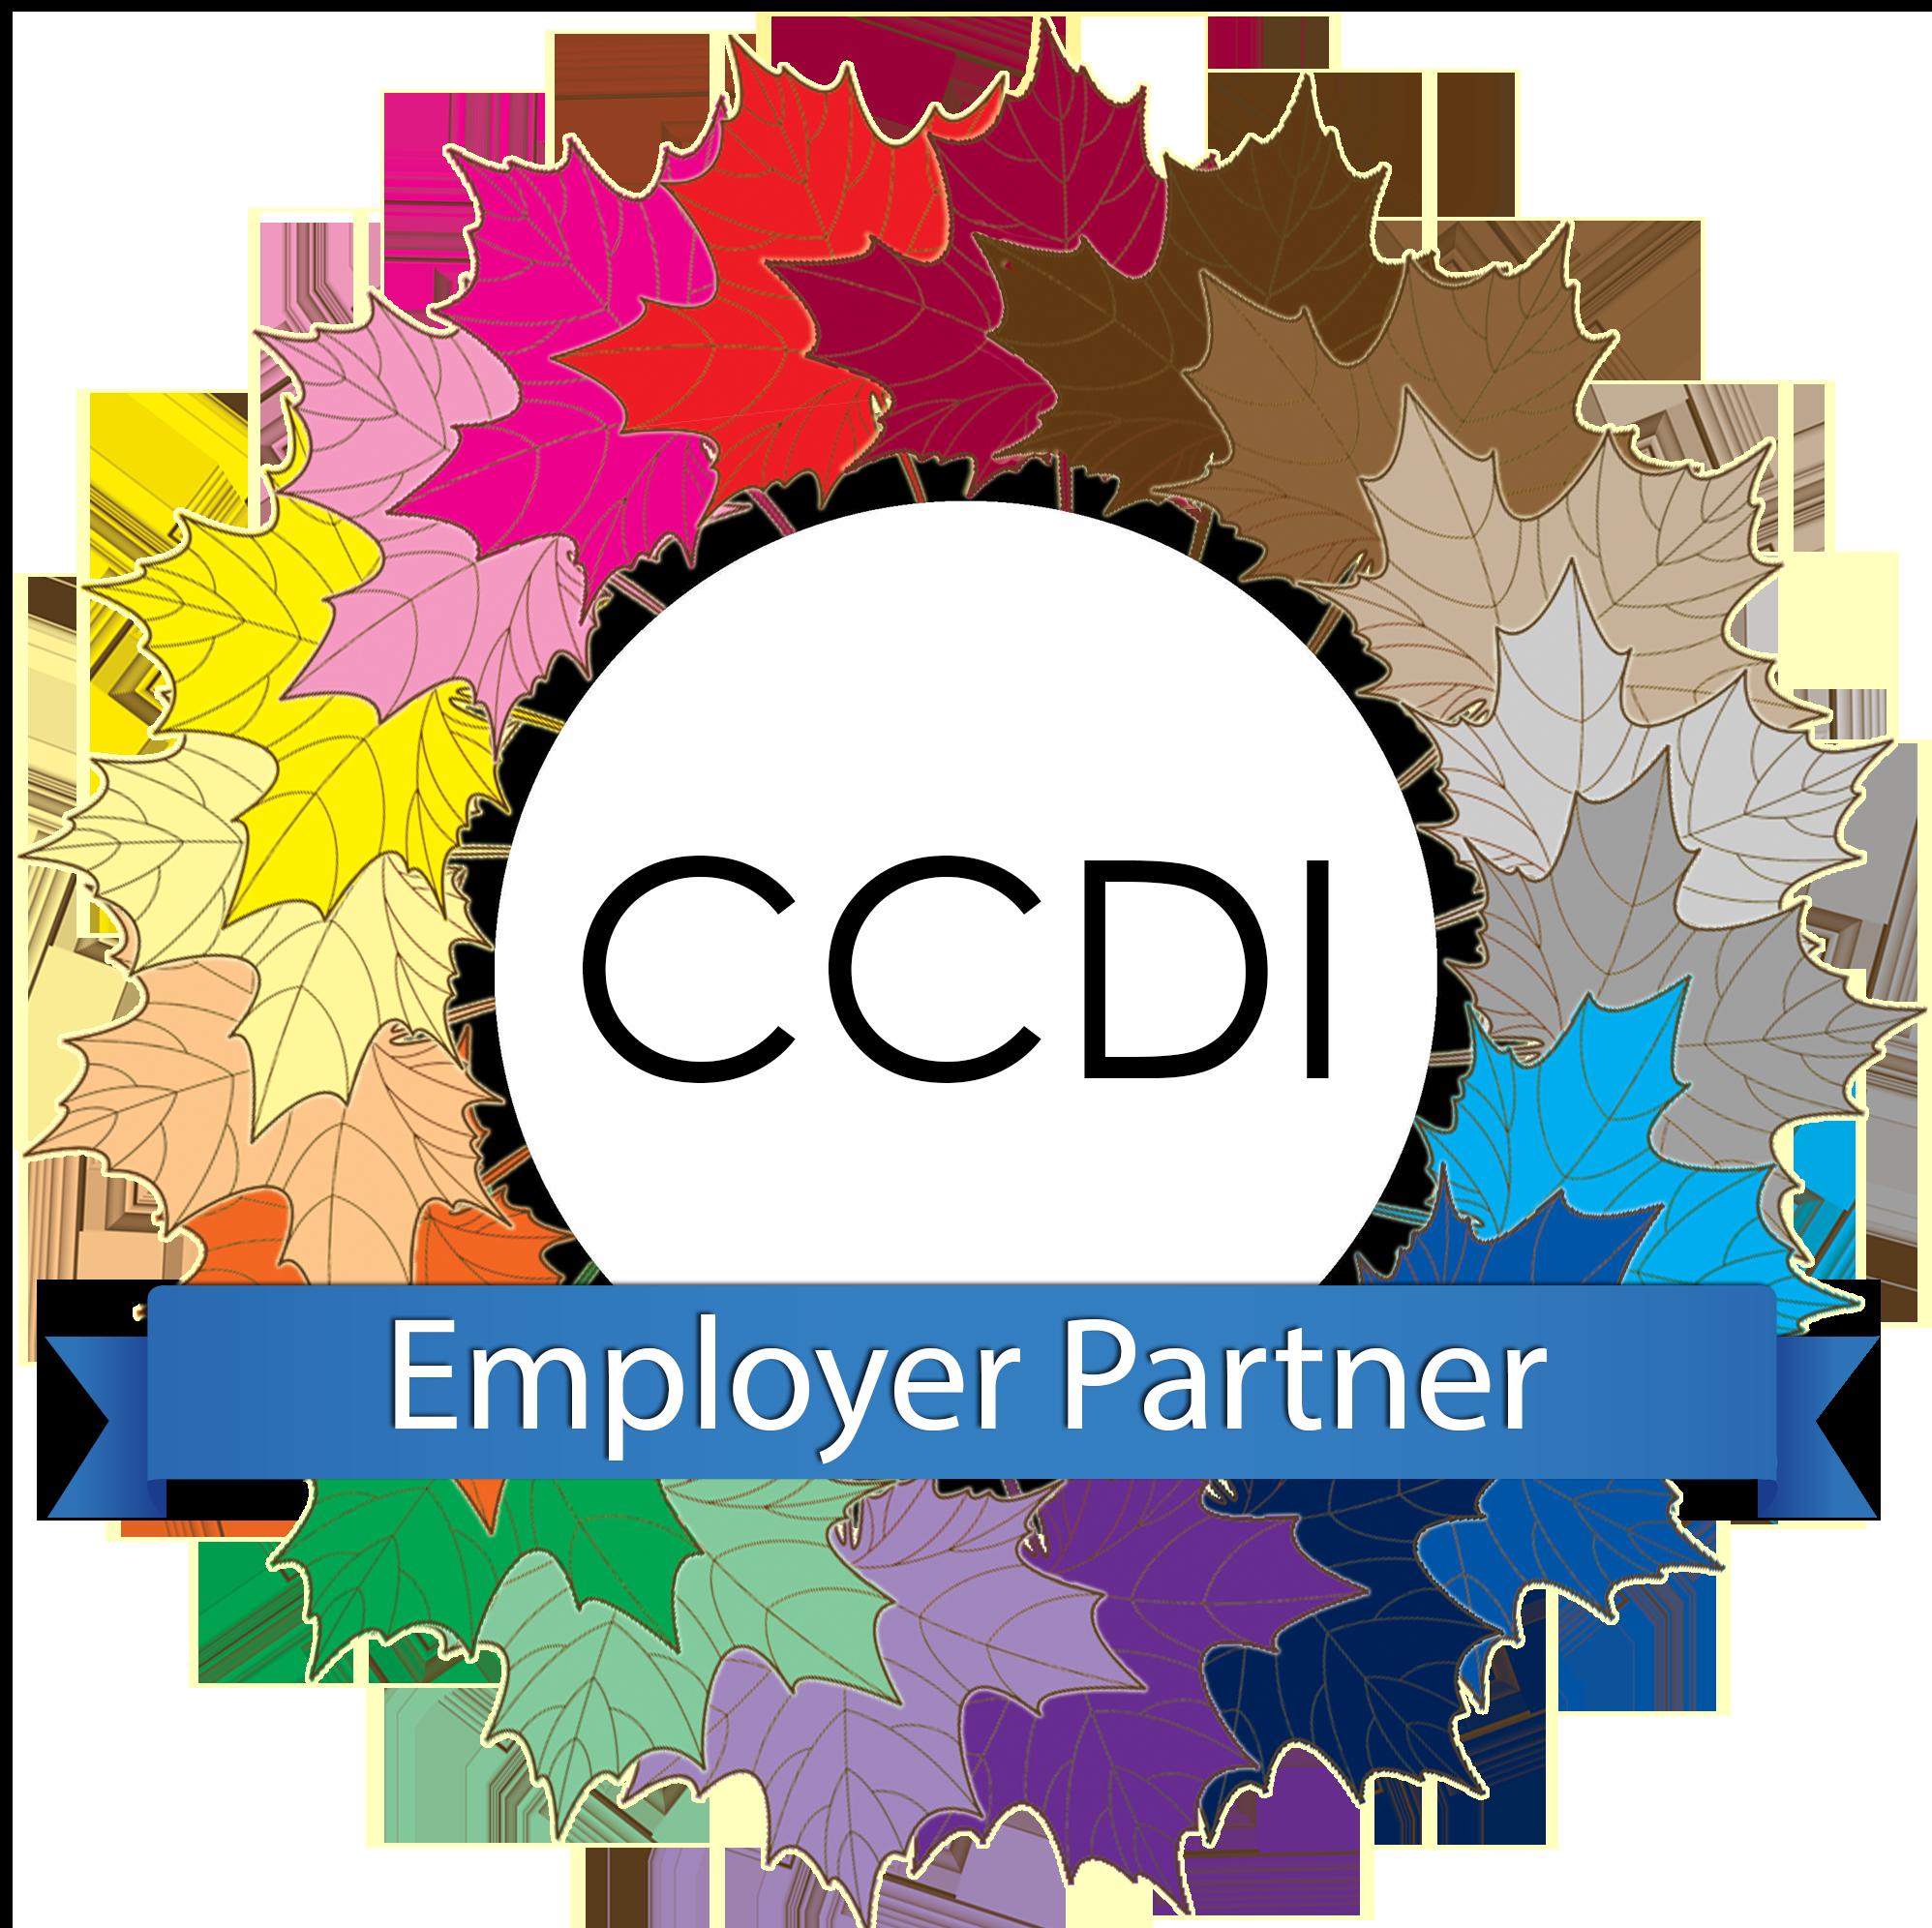 CCDI Employer Partner